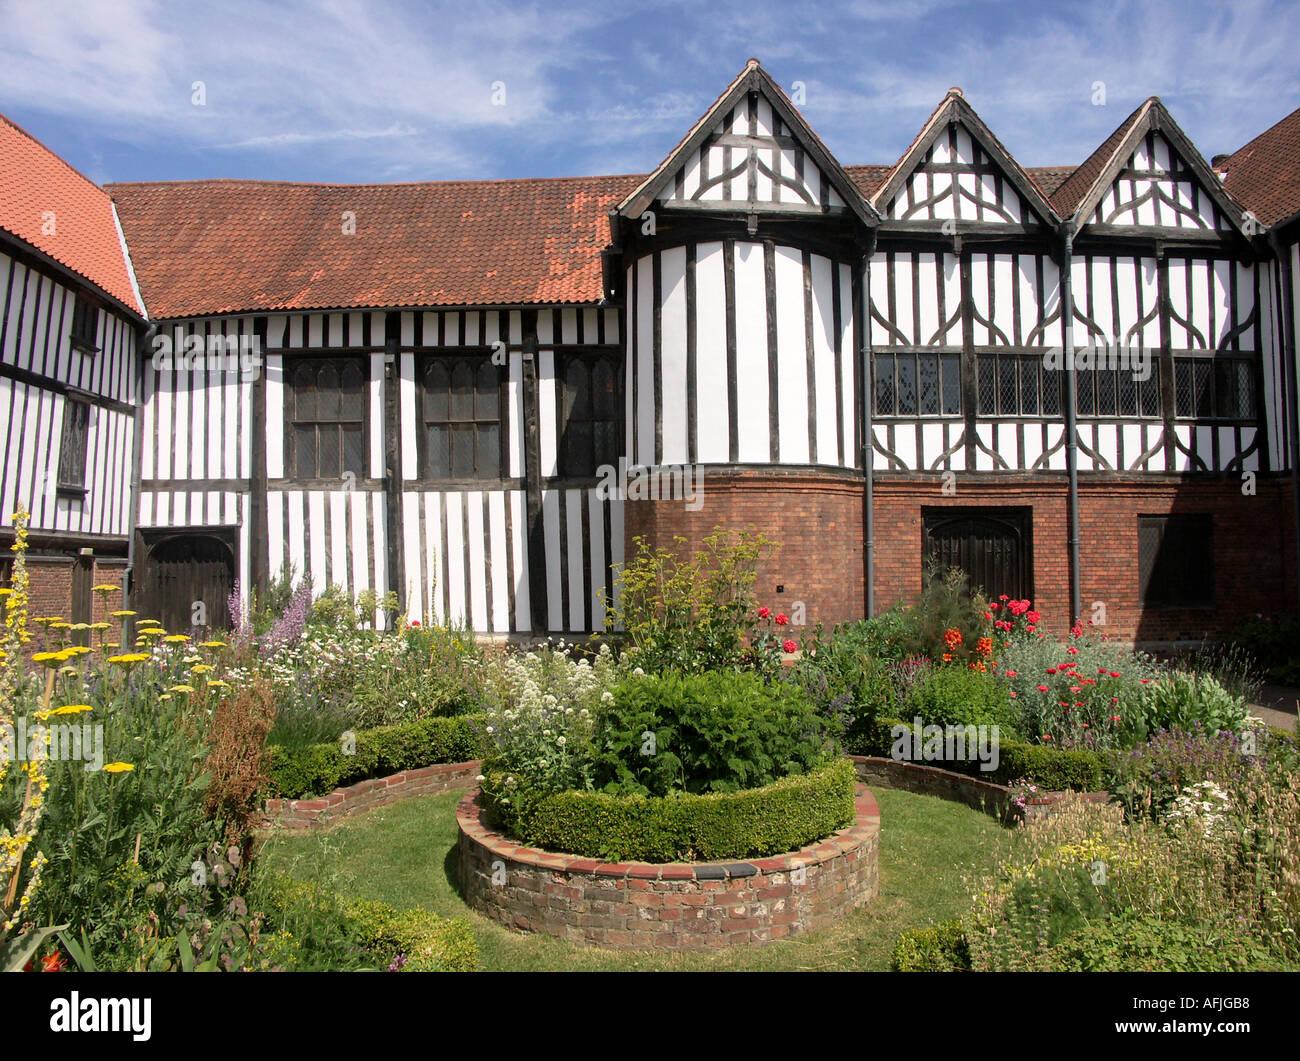 Gainsborough lincolnshire united kingdom